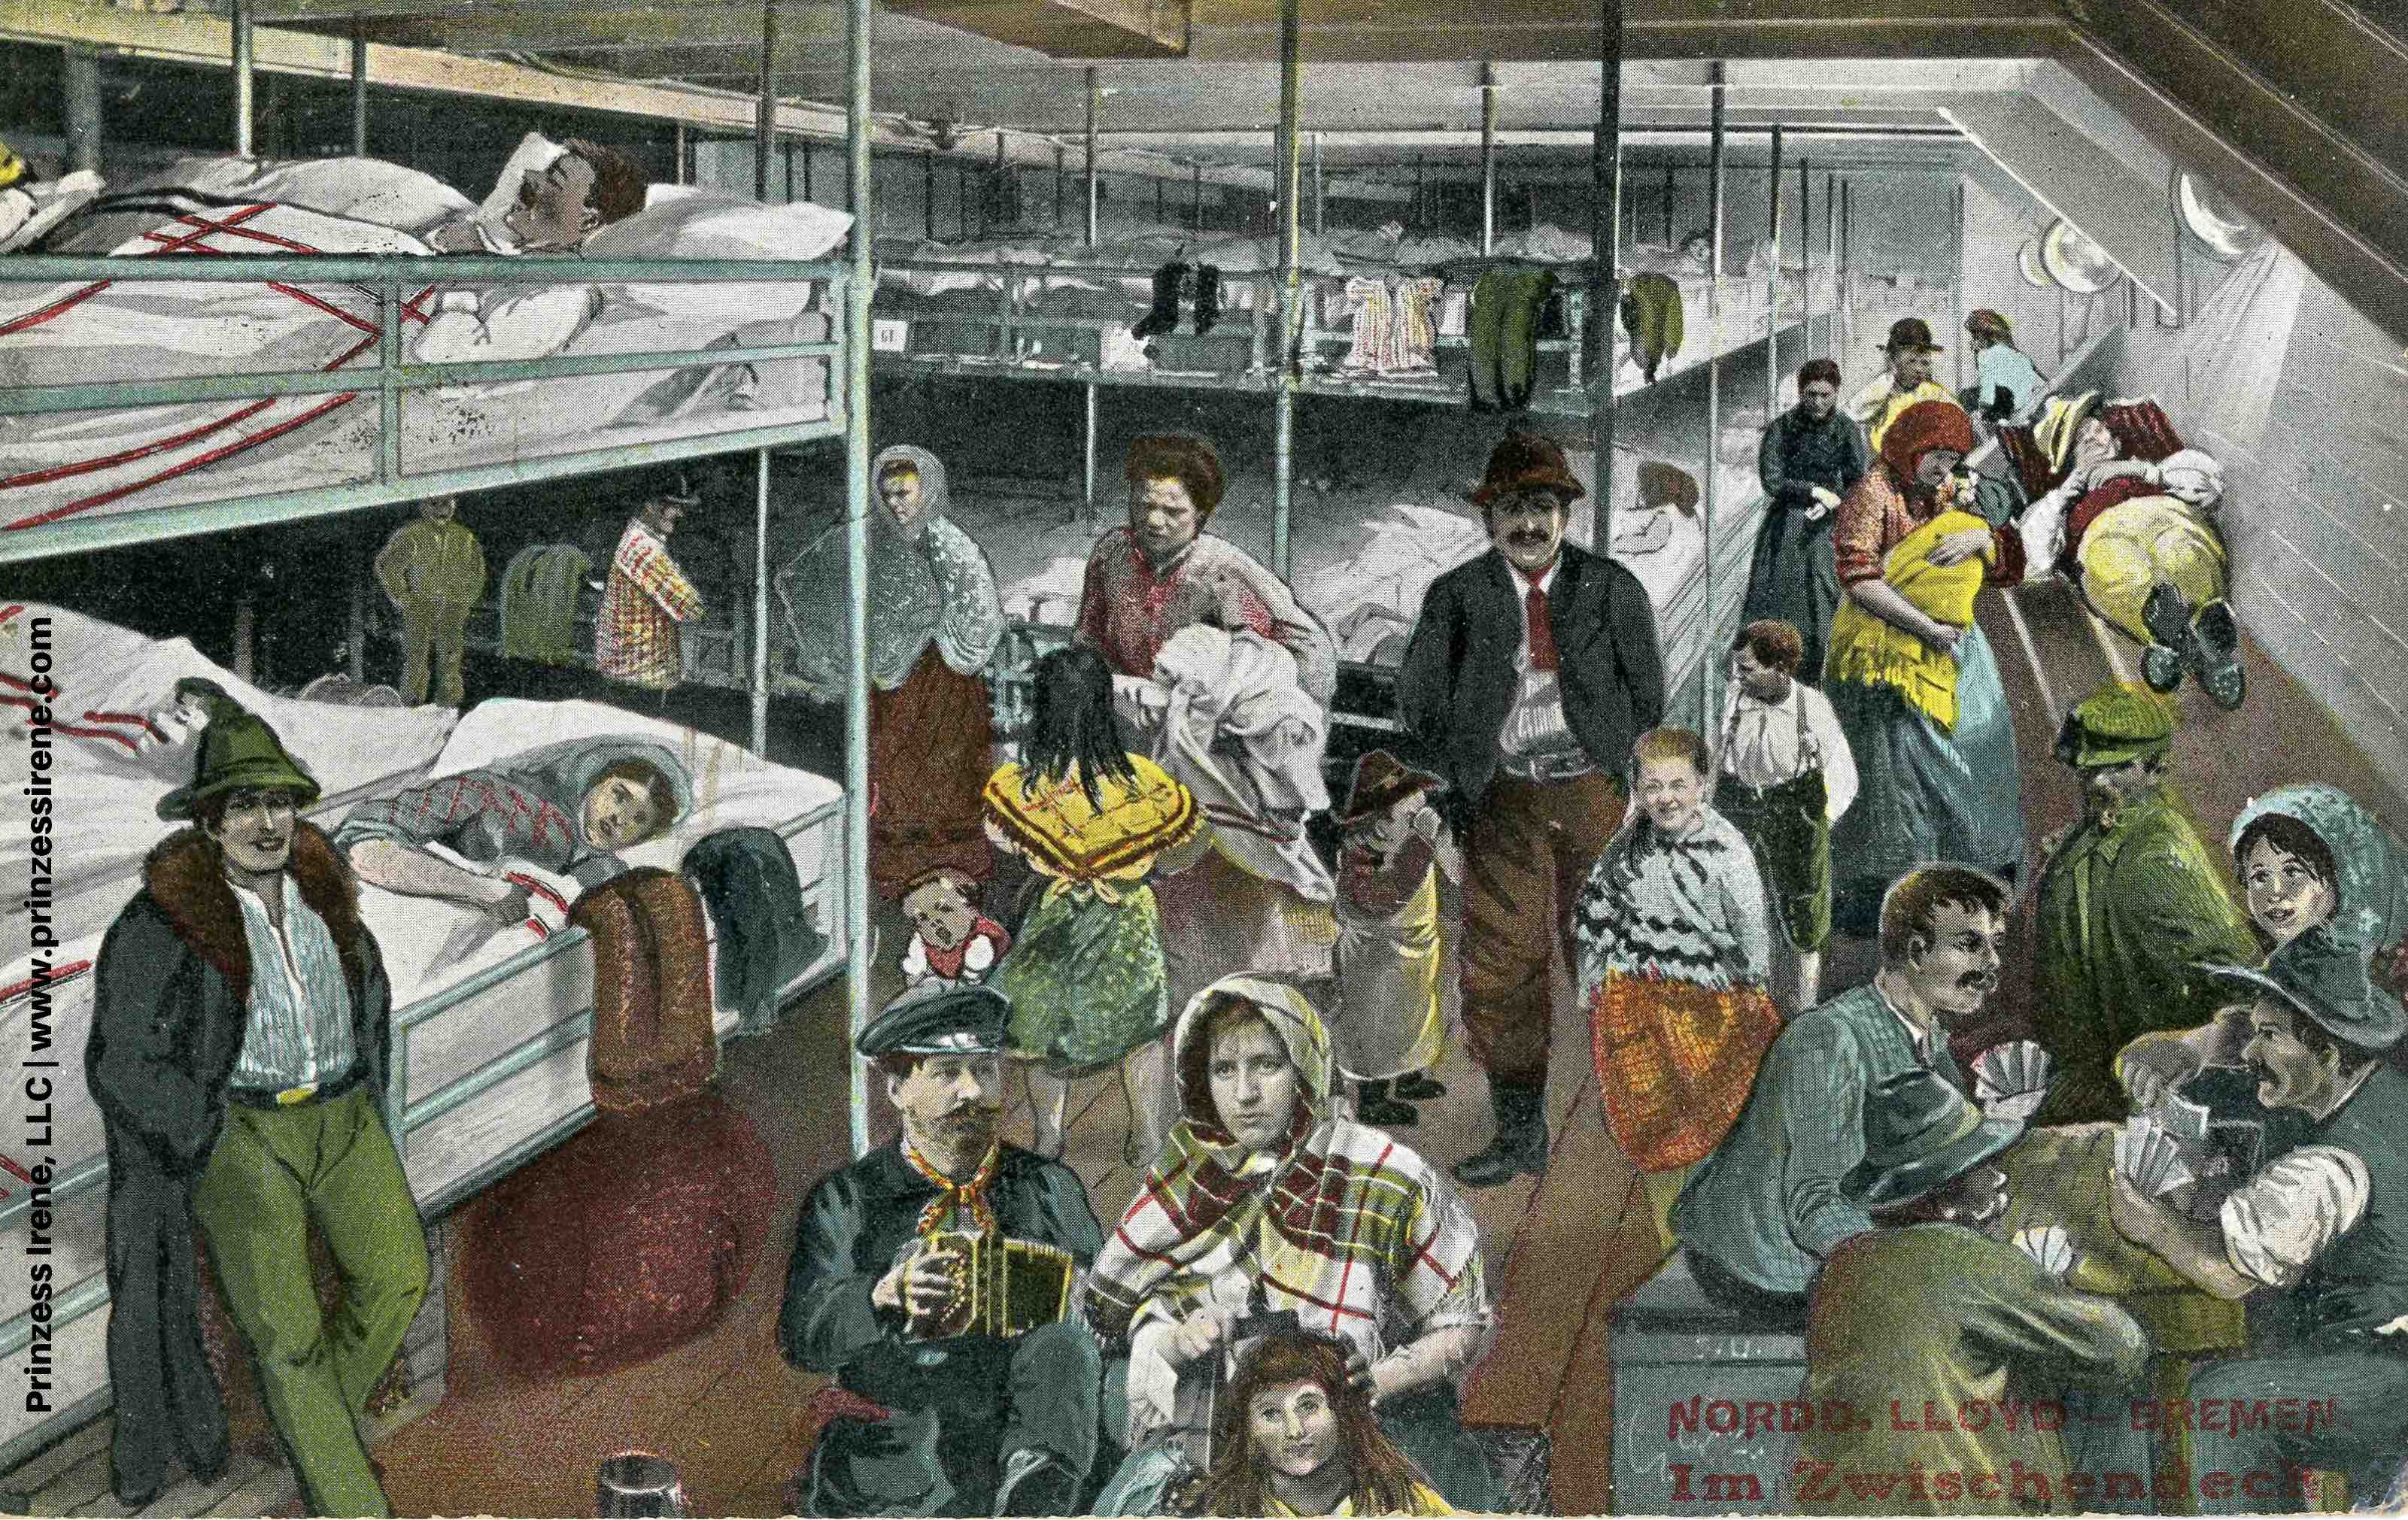 Postcard, postmarked November 20, 1907